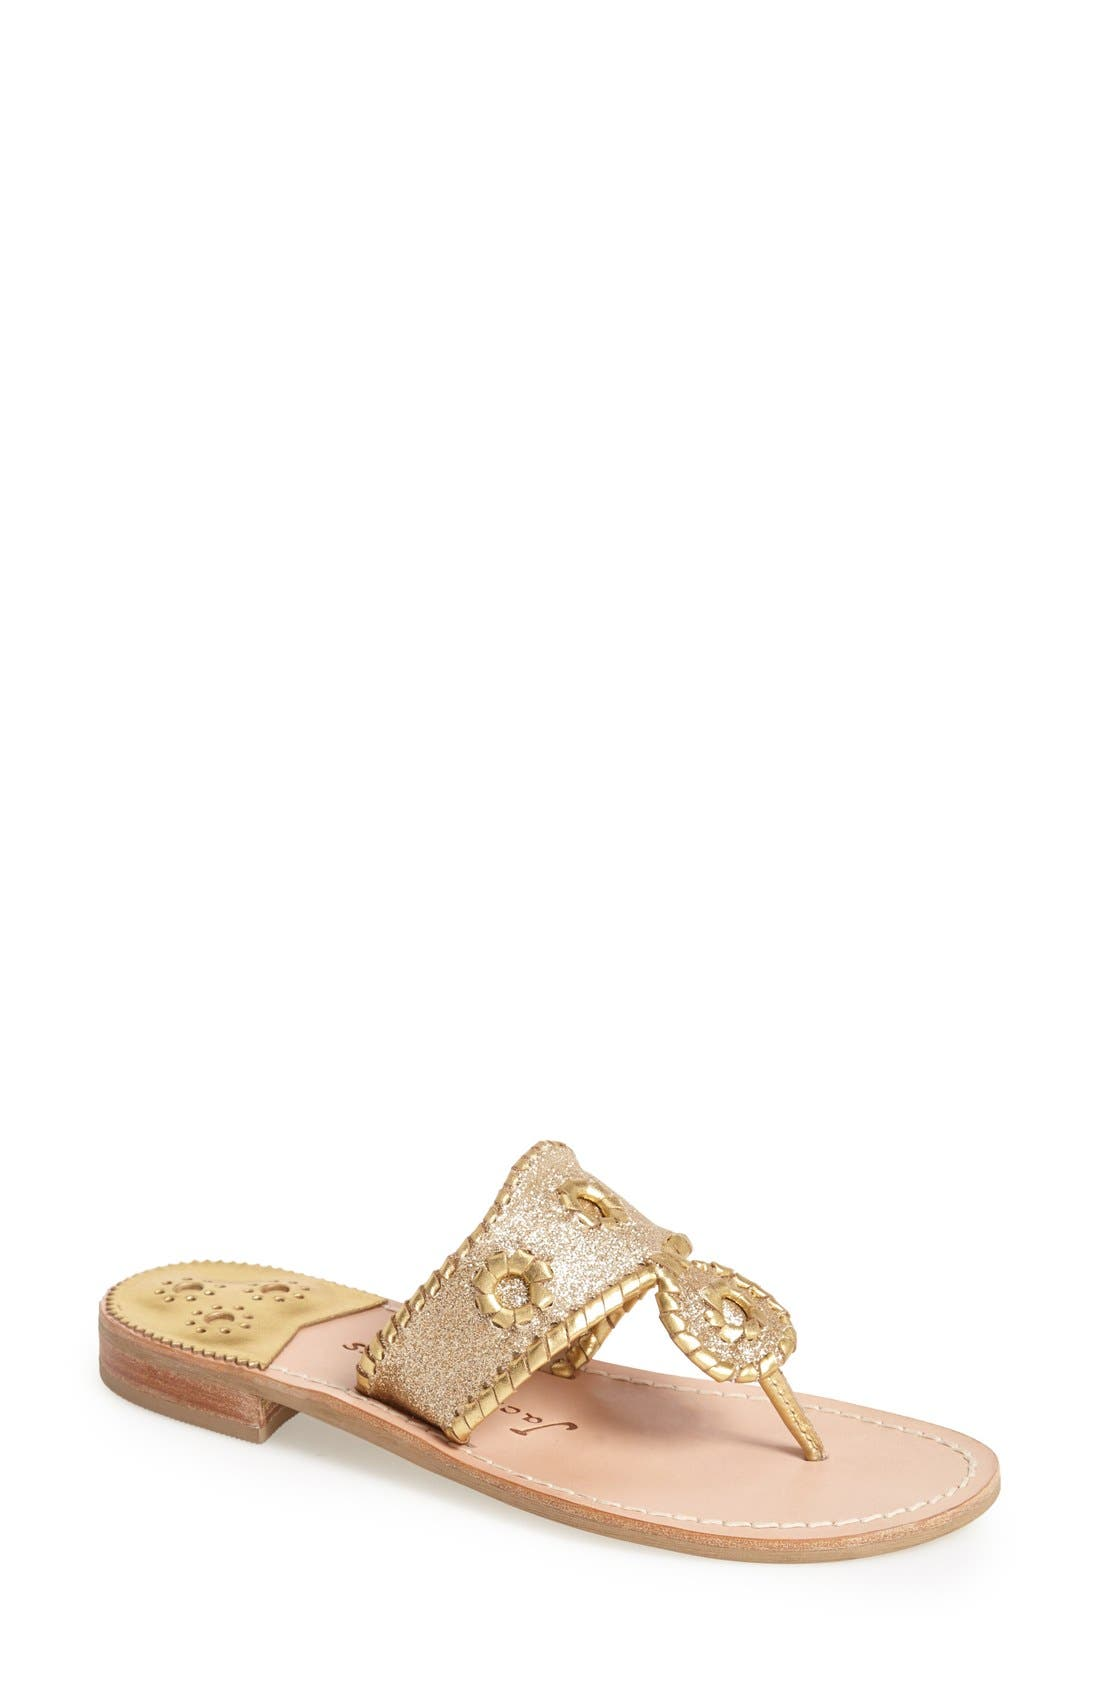 Alternate Image 1 Selected - Jack Rogers 'Sparkle' Sandal (Women)